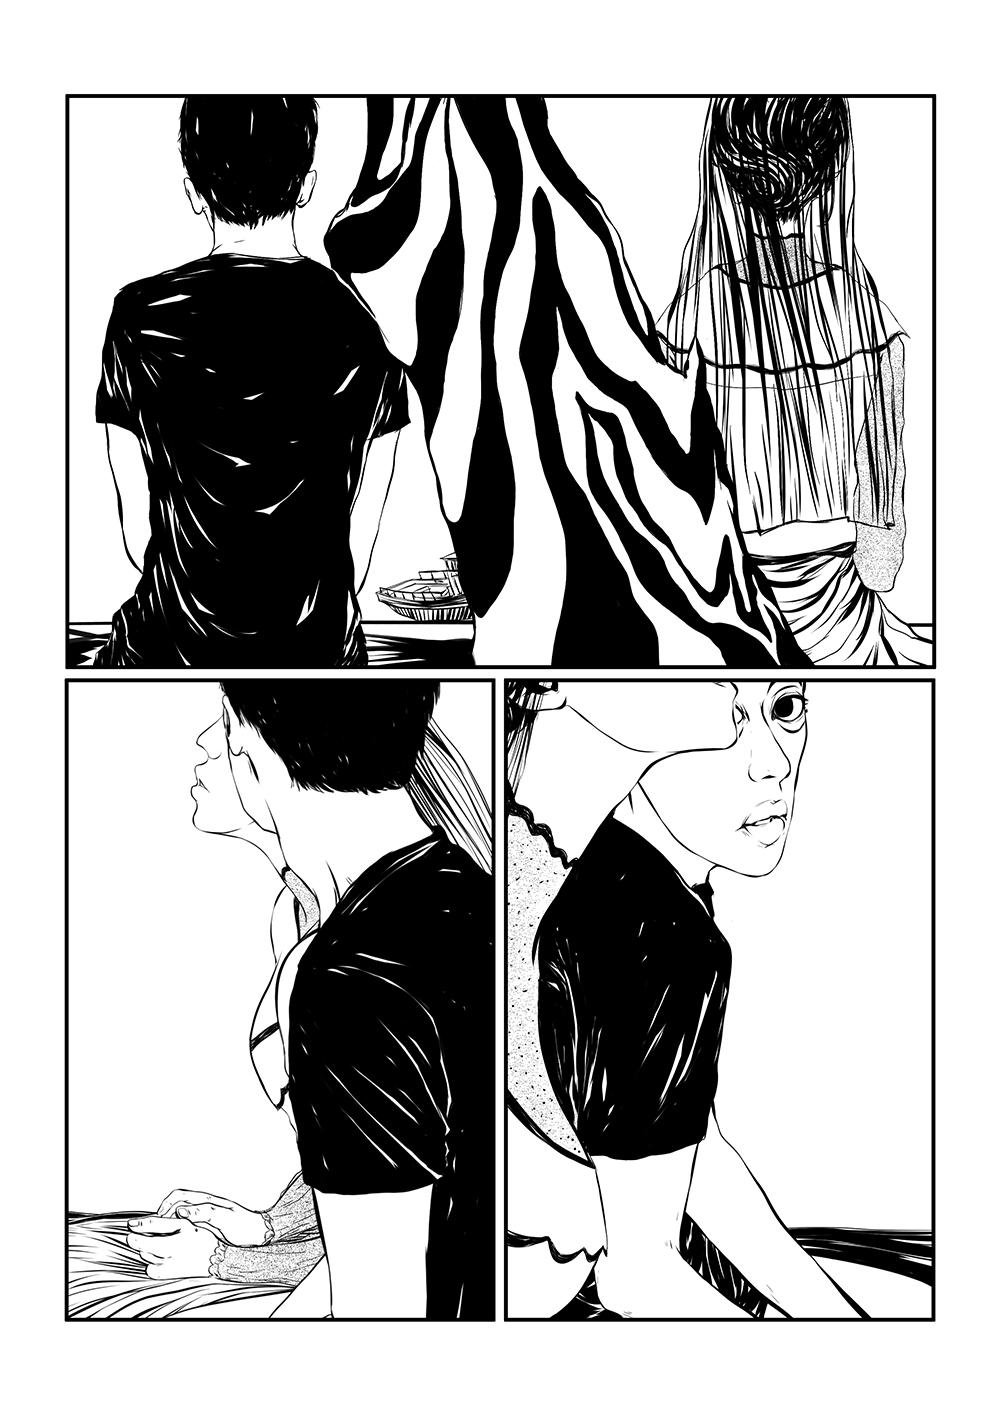 mojowang_illustration_betweenrivers_21_10.jpg